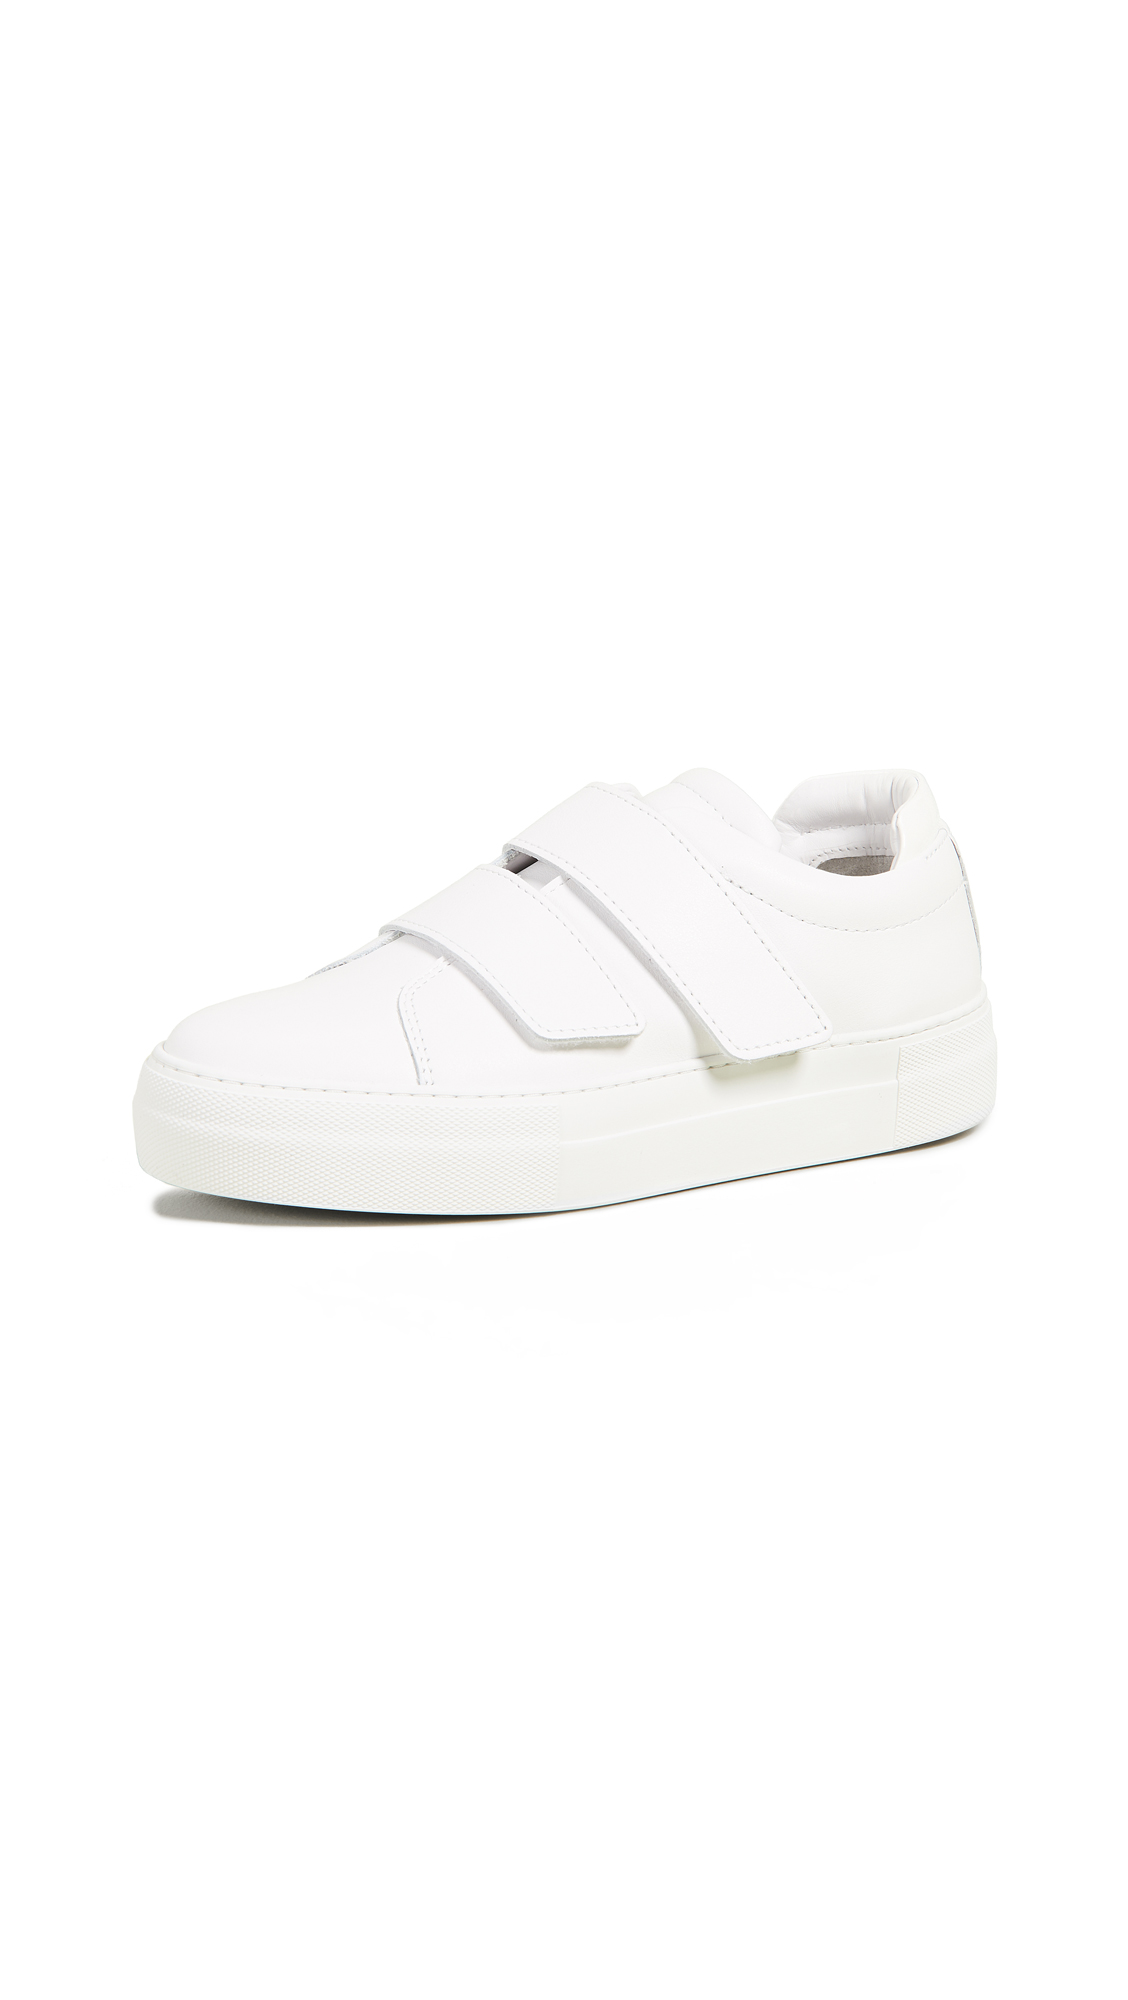 WANT Les Essentiels Lalibela Velcro Strap Sneakers